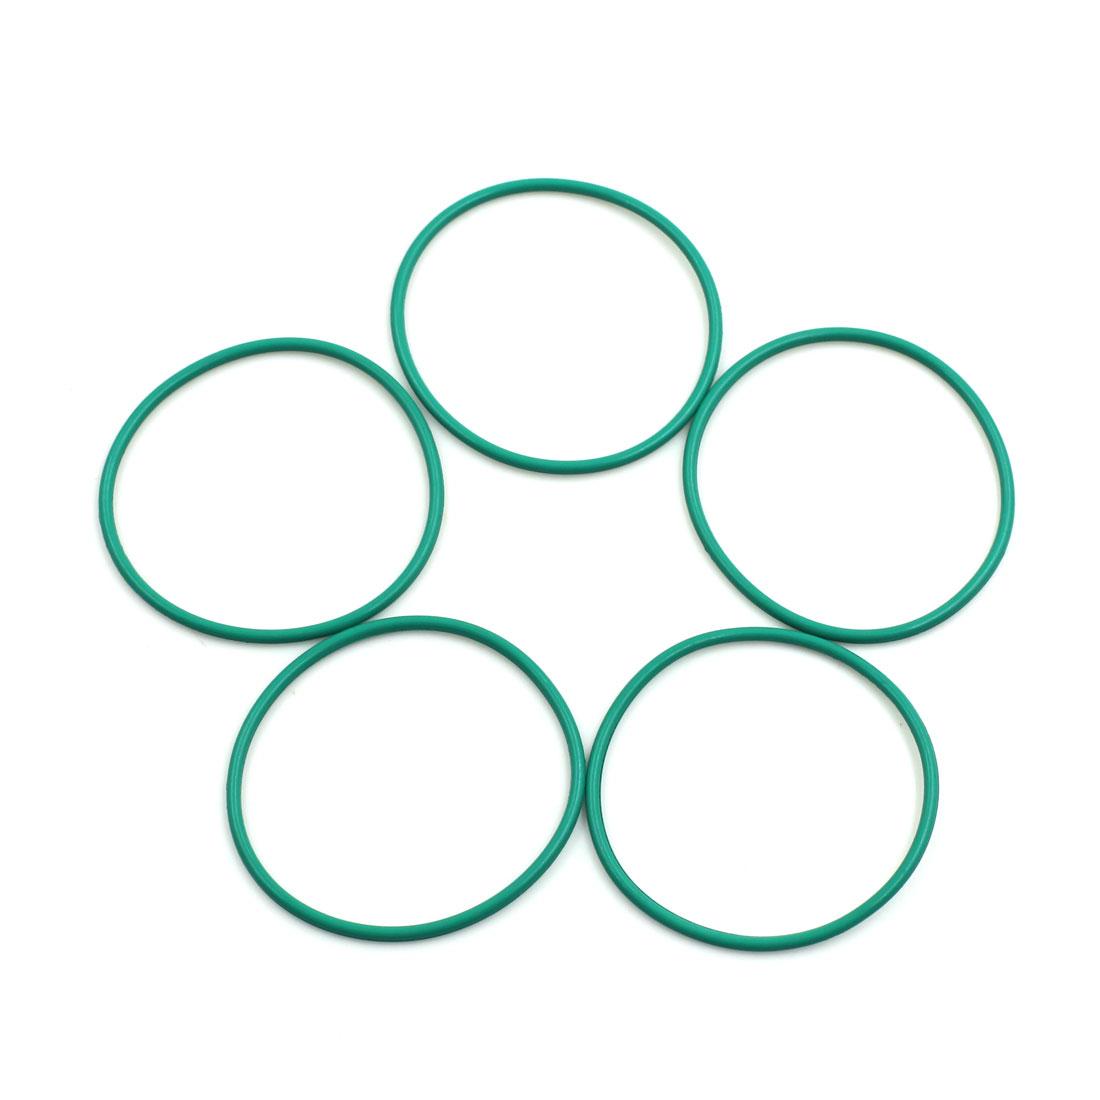 5pcs Green Universal FKM O-Ring Sealing Gasket Washer for Car 46mm x 2mm